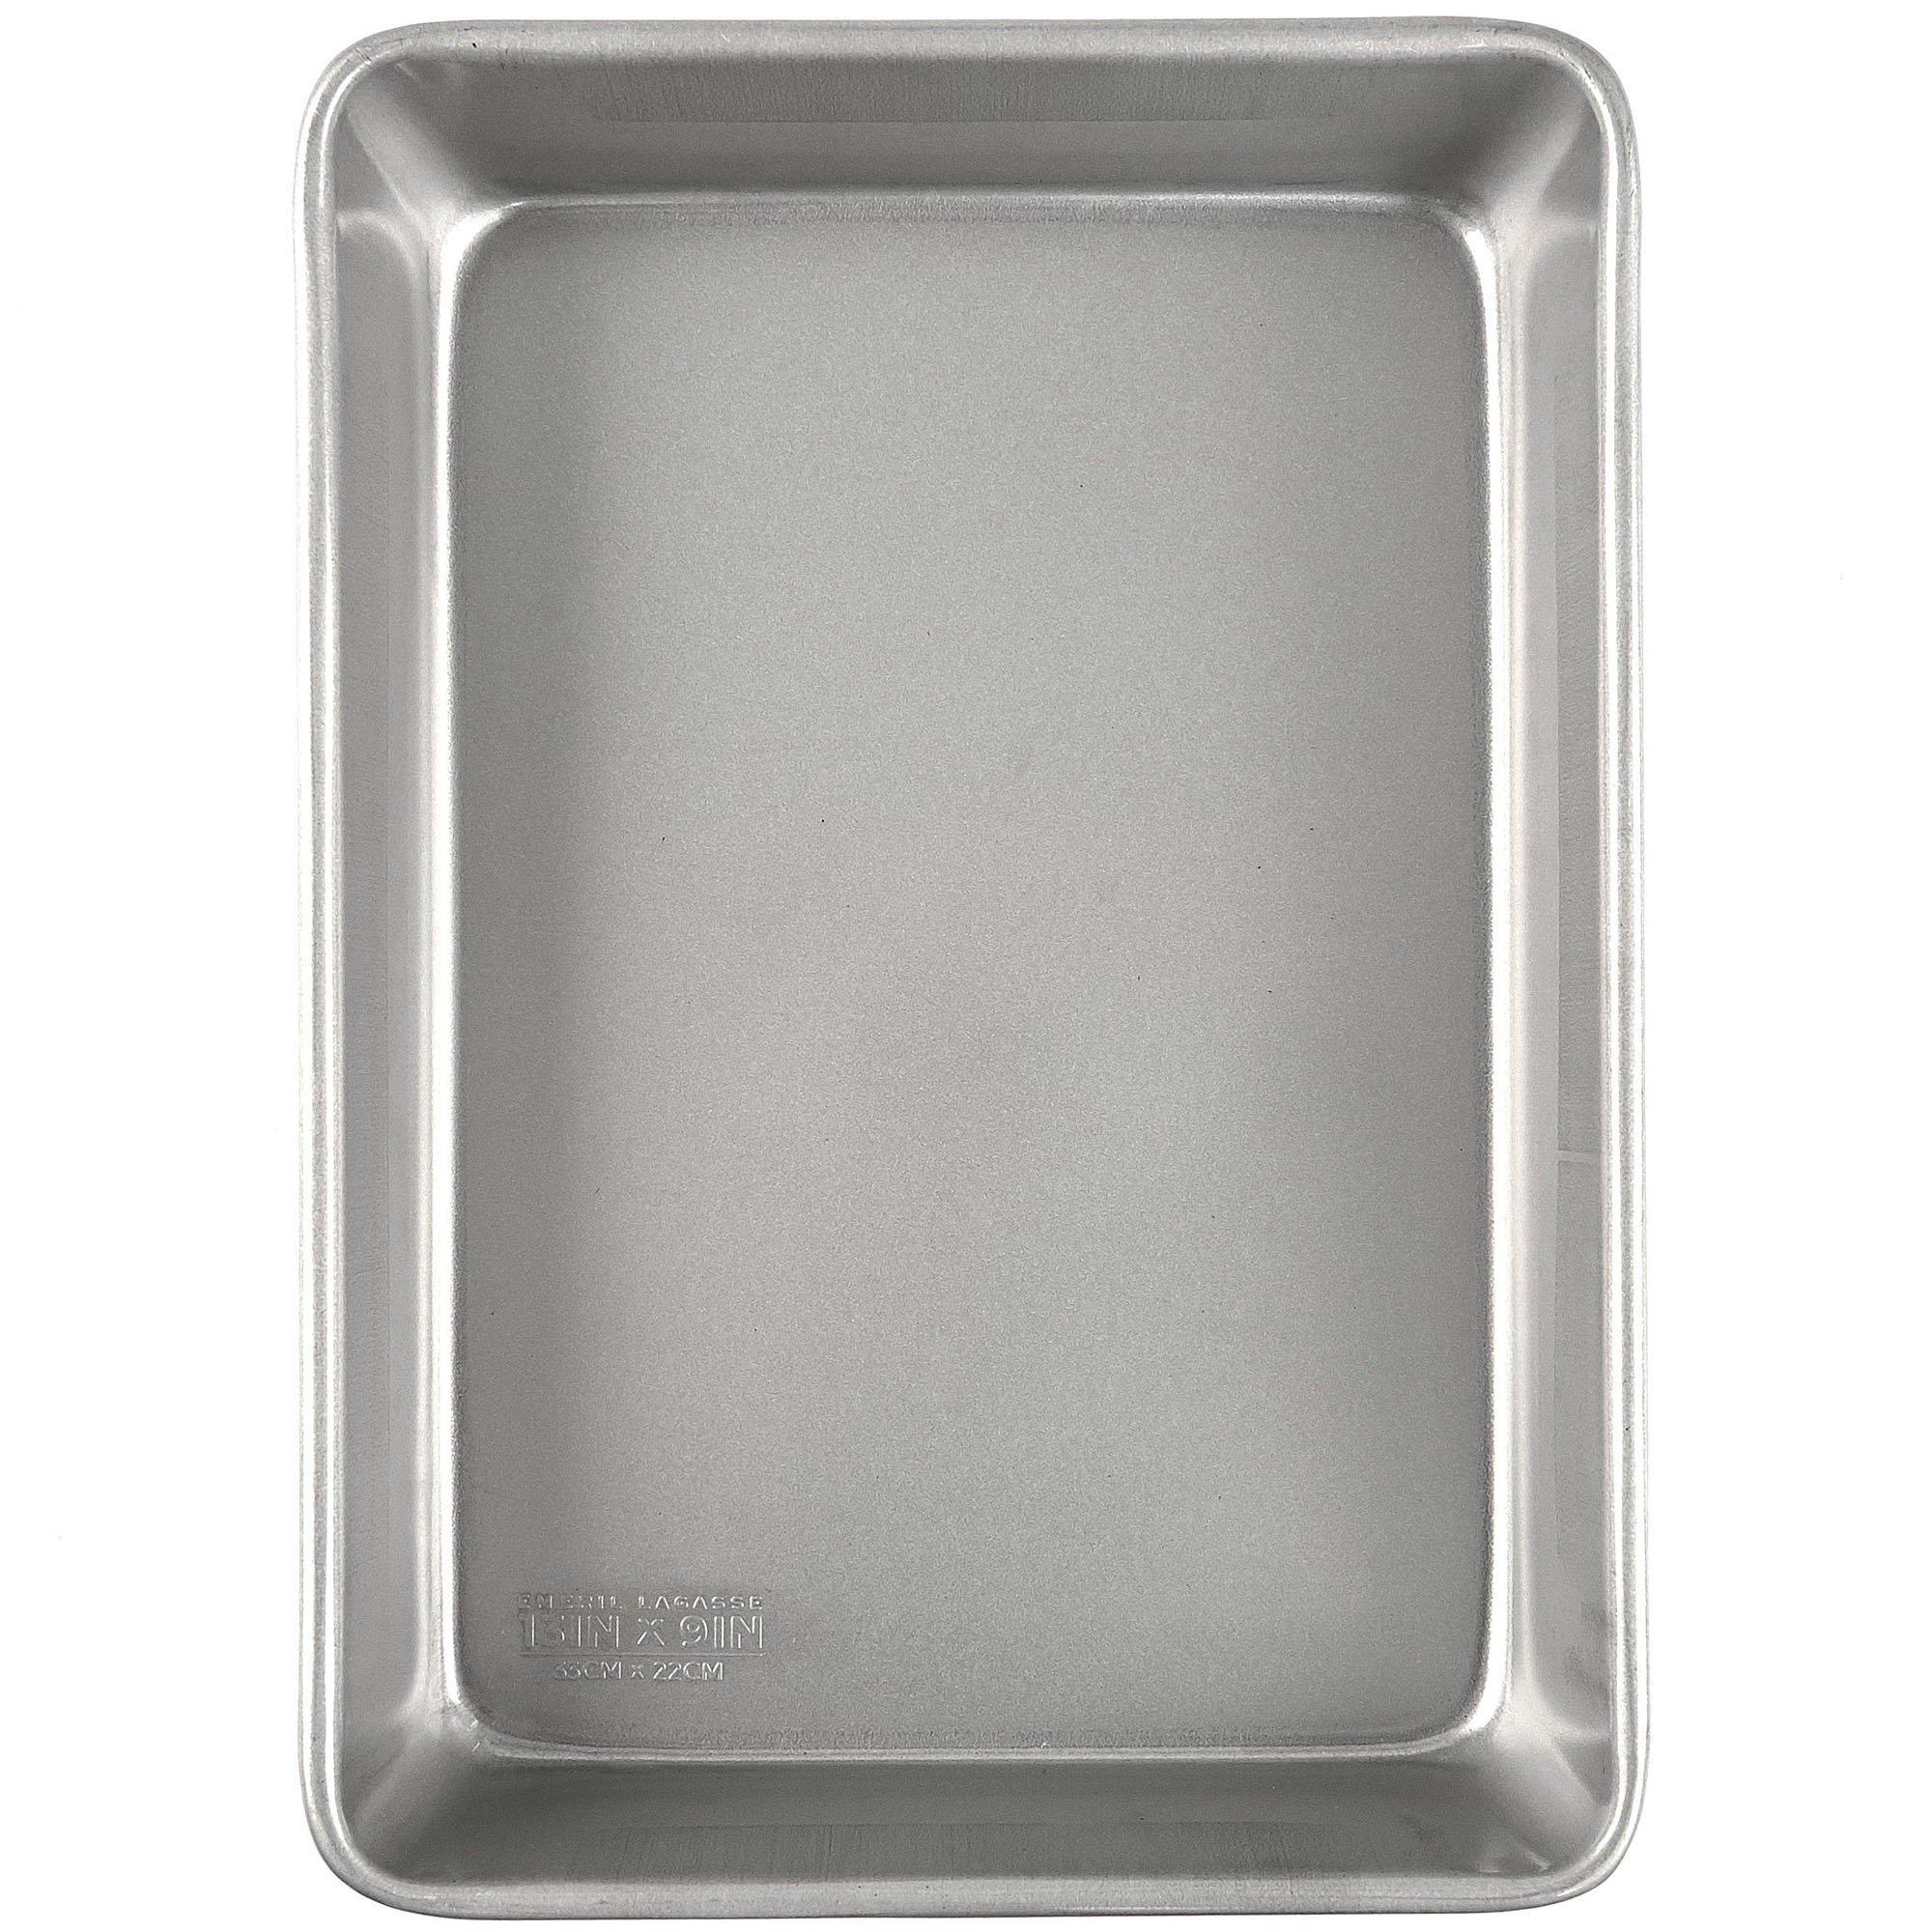 Emeril Lagasse 62670 Aluminized Steel Nonstick 5-Piece Bakeware Set by Emeril Lagasse (Image #3)